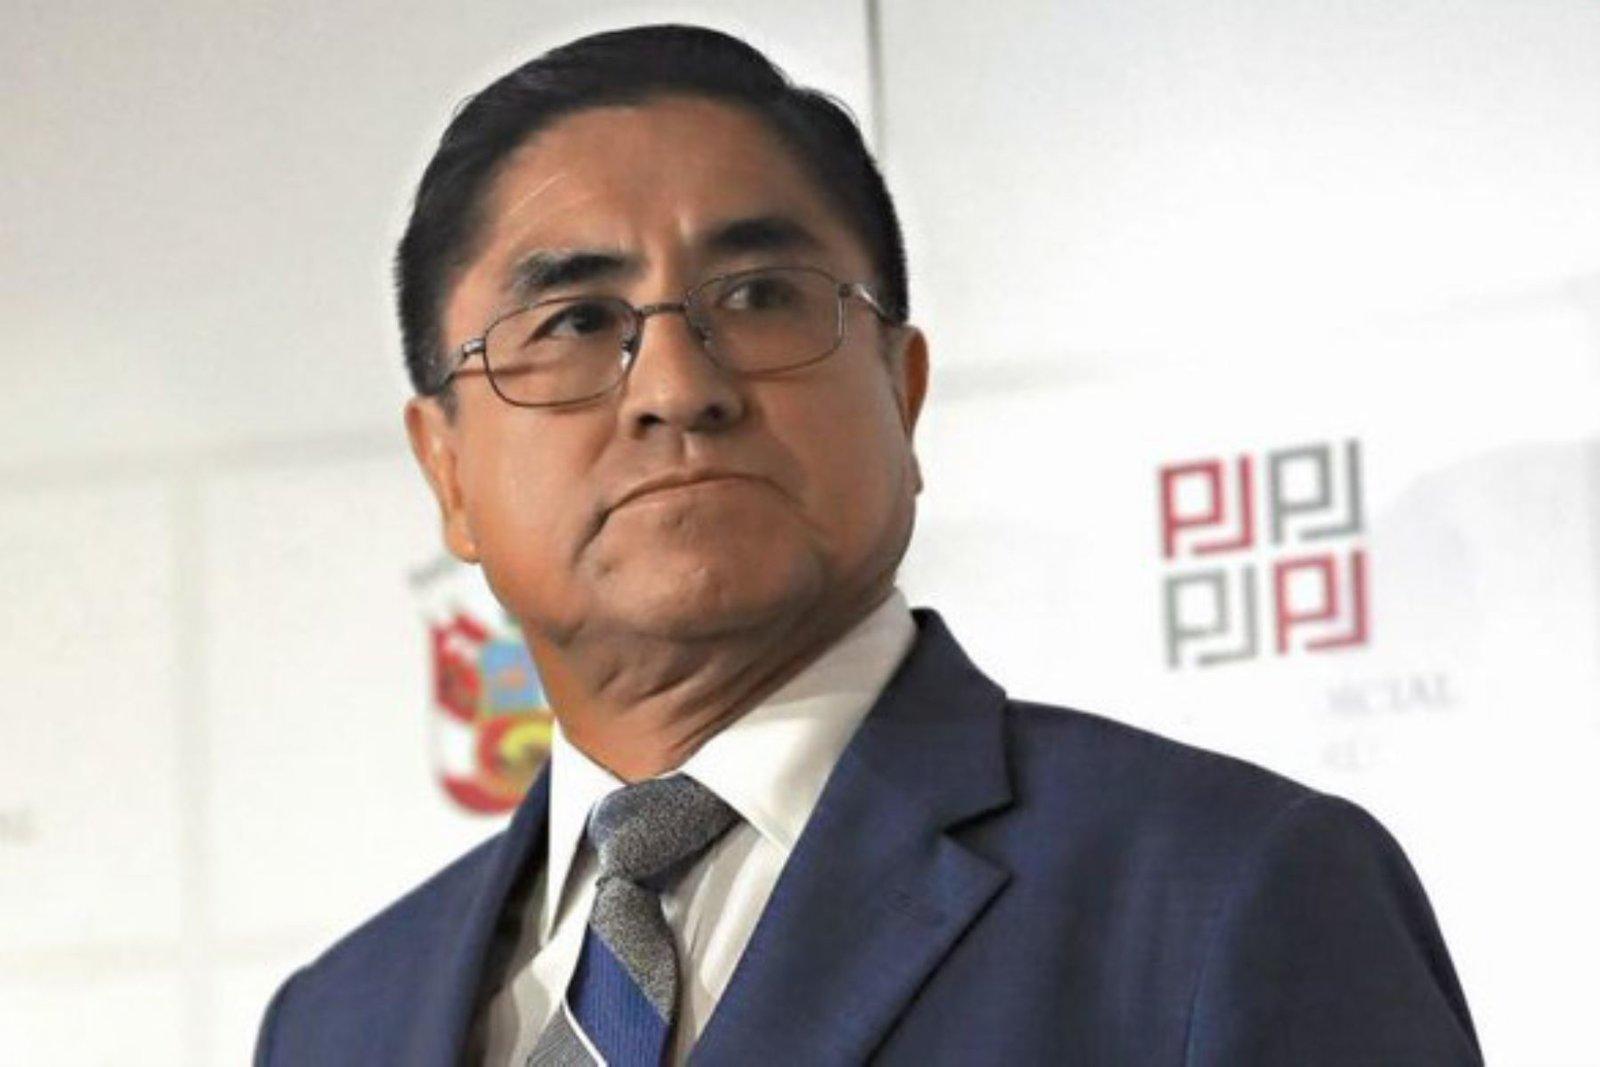 Justicia de Perú pedirá a España que amplíe extradición de exjuez Hinostroza